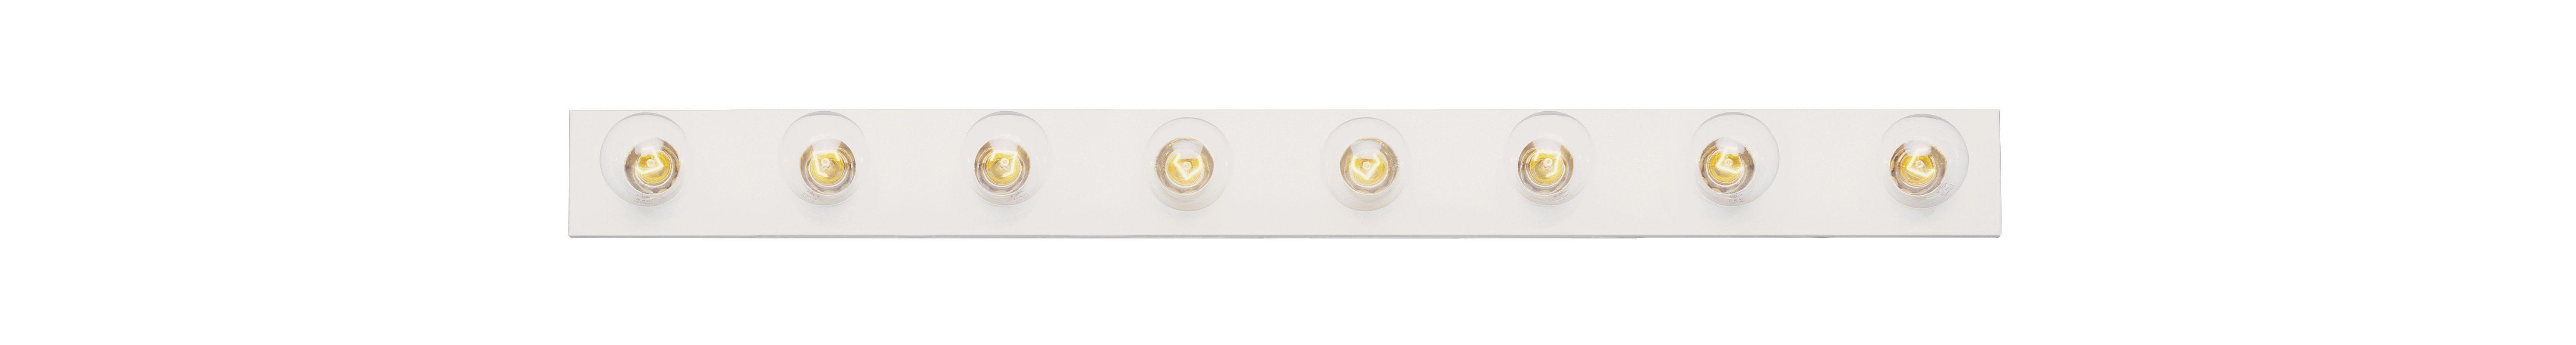 "Trans Globe Lighting 3008 Eight Light 48"" Wide Bath Bar Polished"